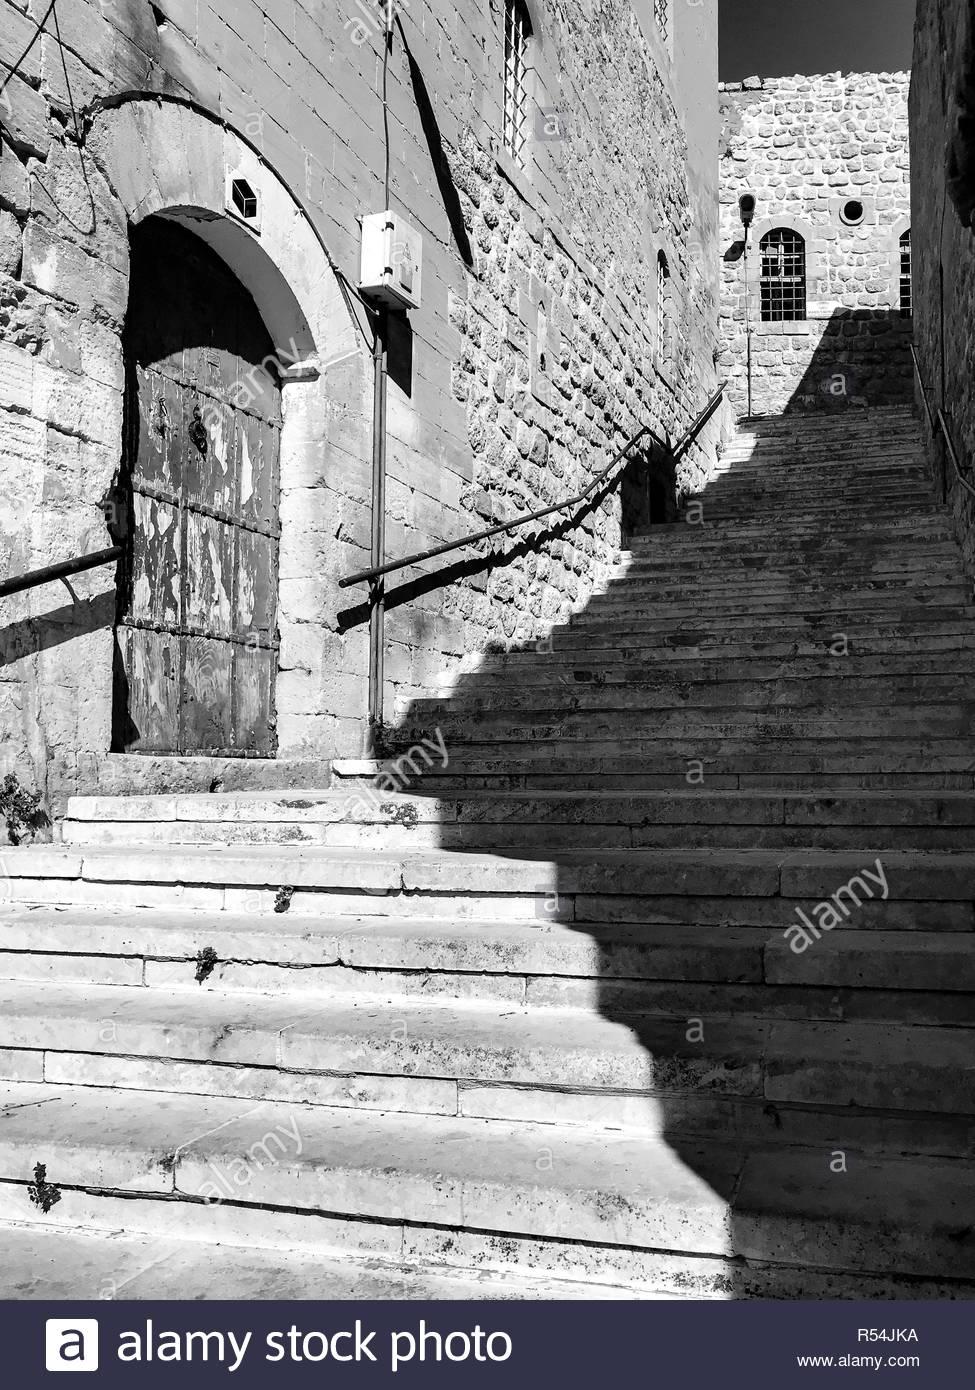 Street scenes from Mardin old city and surrounding areas. Mardin / Turkey: September 2018 by Hulki Okan Tabak. - Stock Image